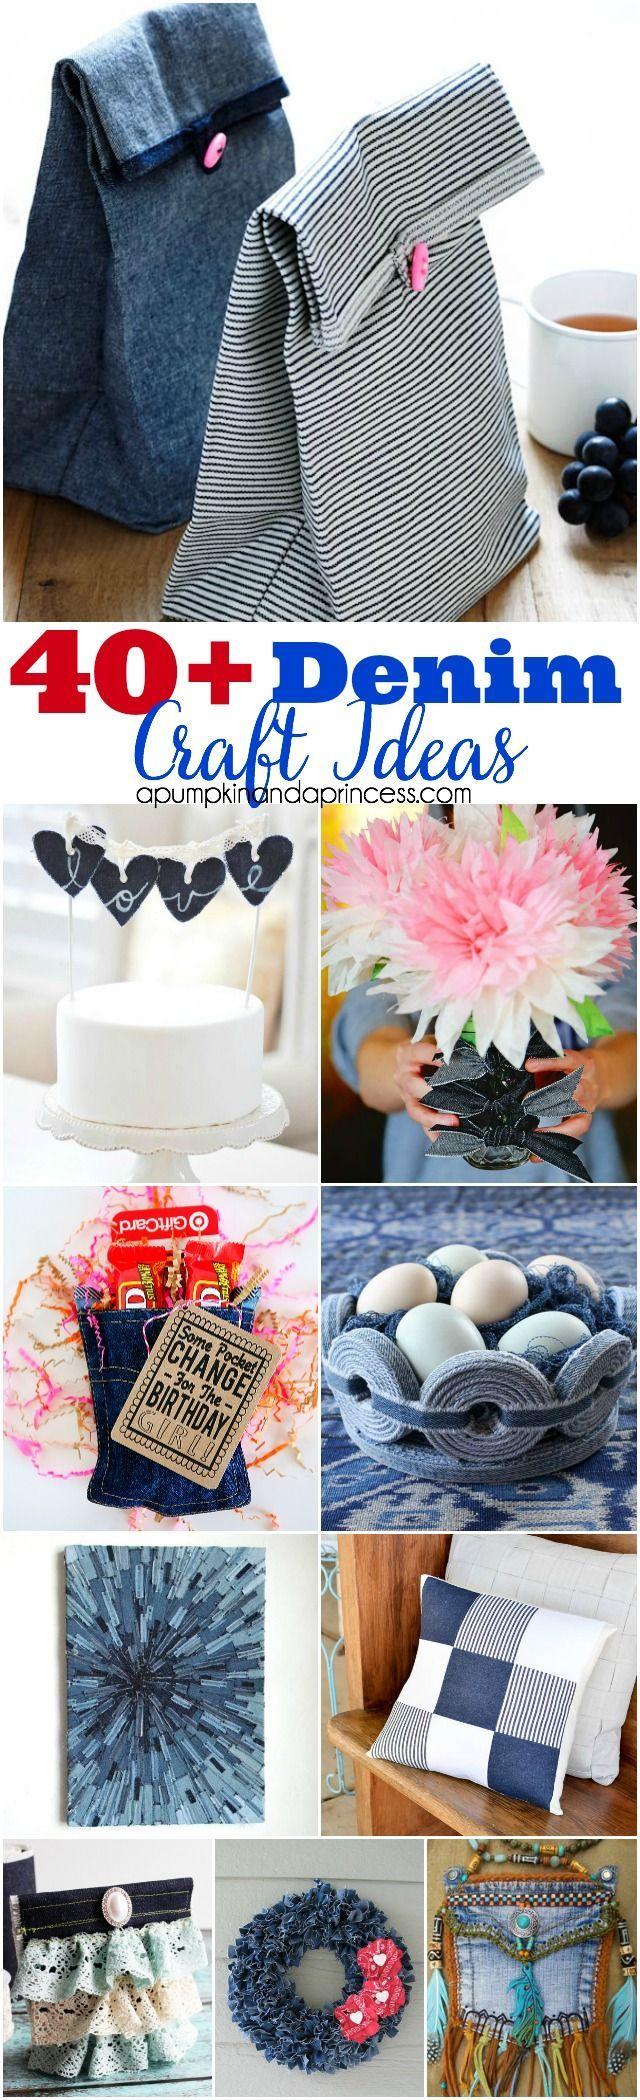 40+ Creative Denim Ideas